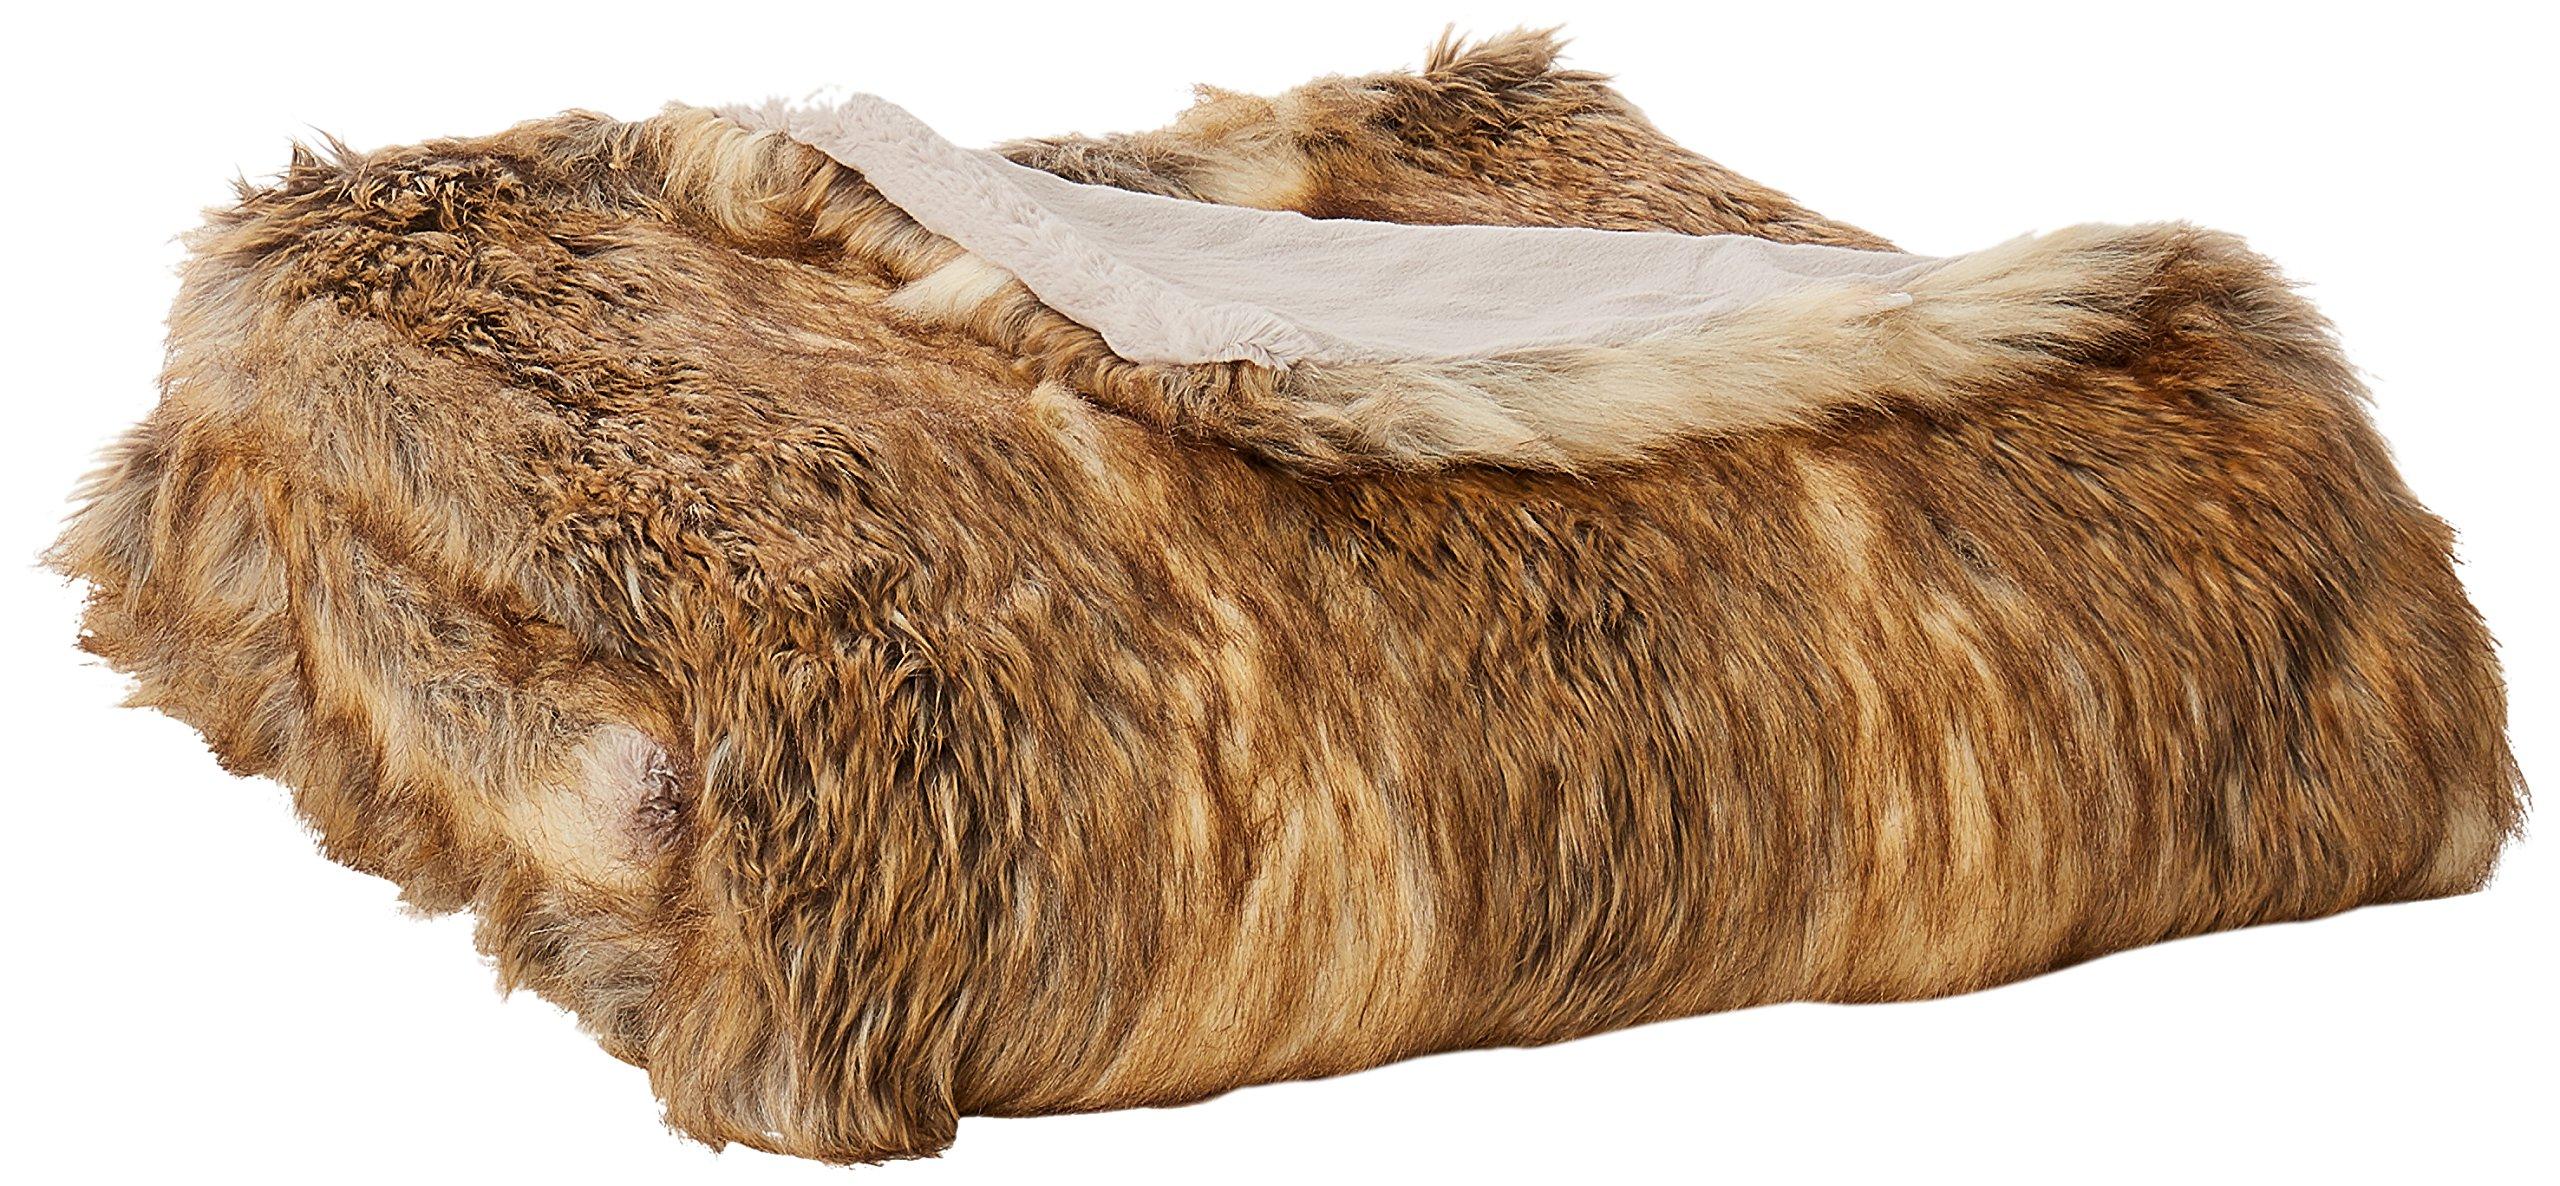 Best Home Fashion Faux Fur Throw - Lounge Blanket - Amber Fox - 58''W x 60''L - (1 Throw)